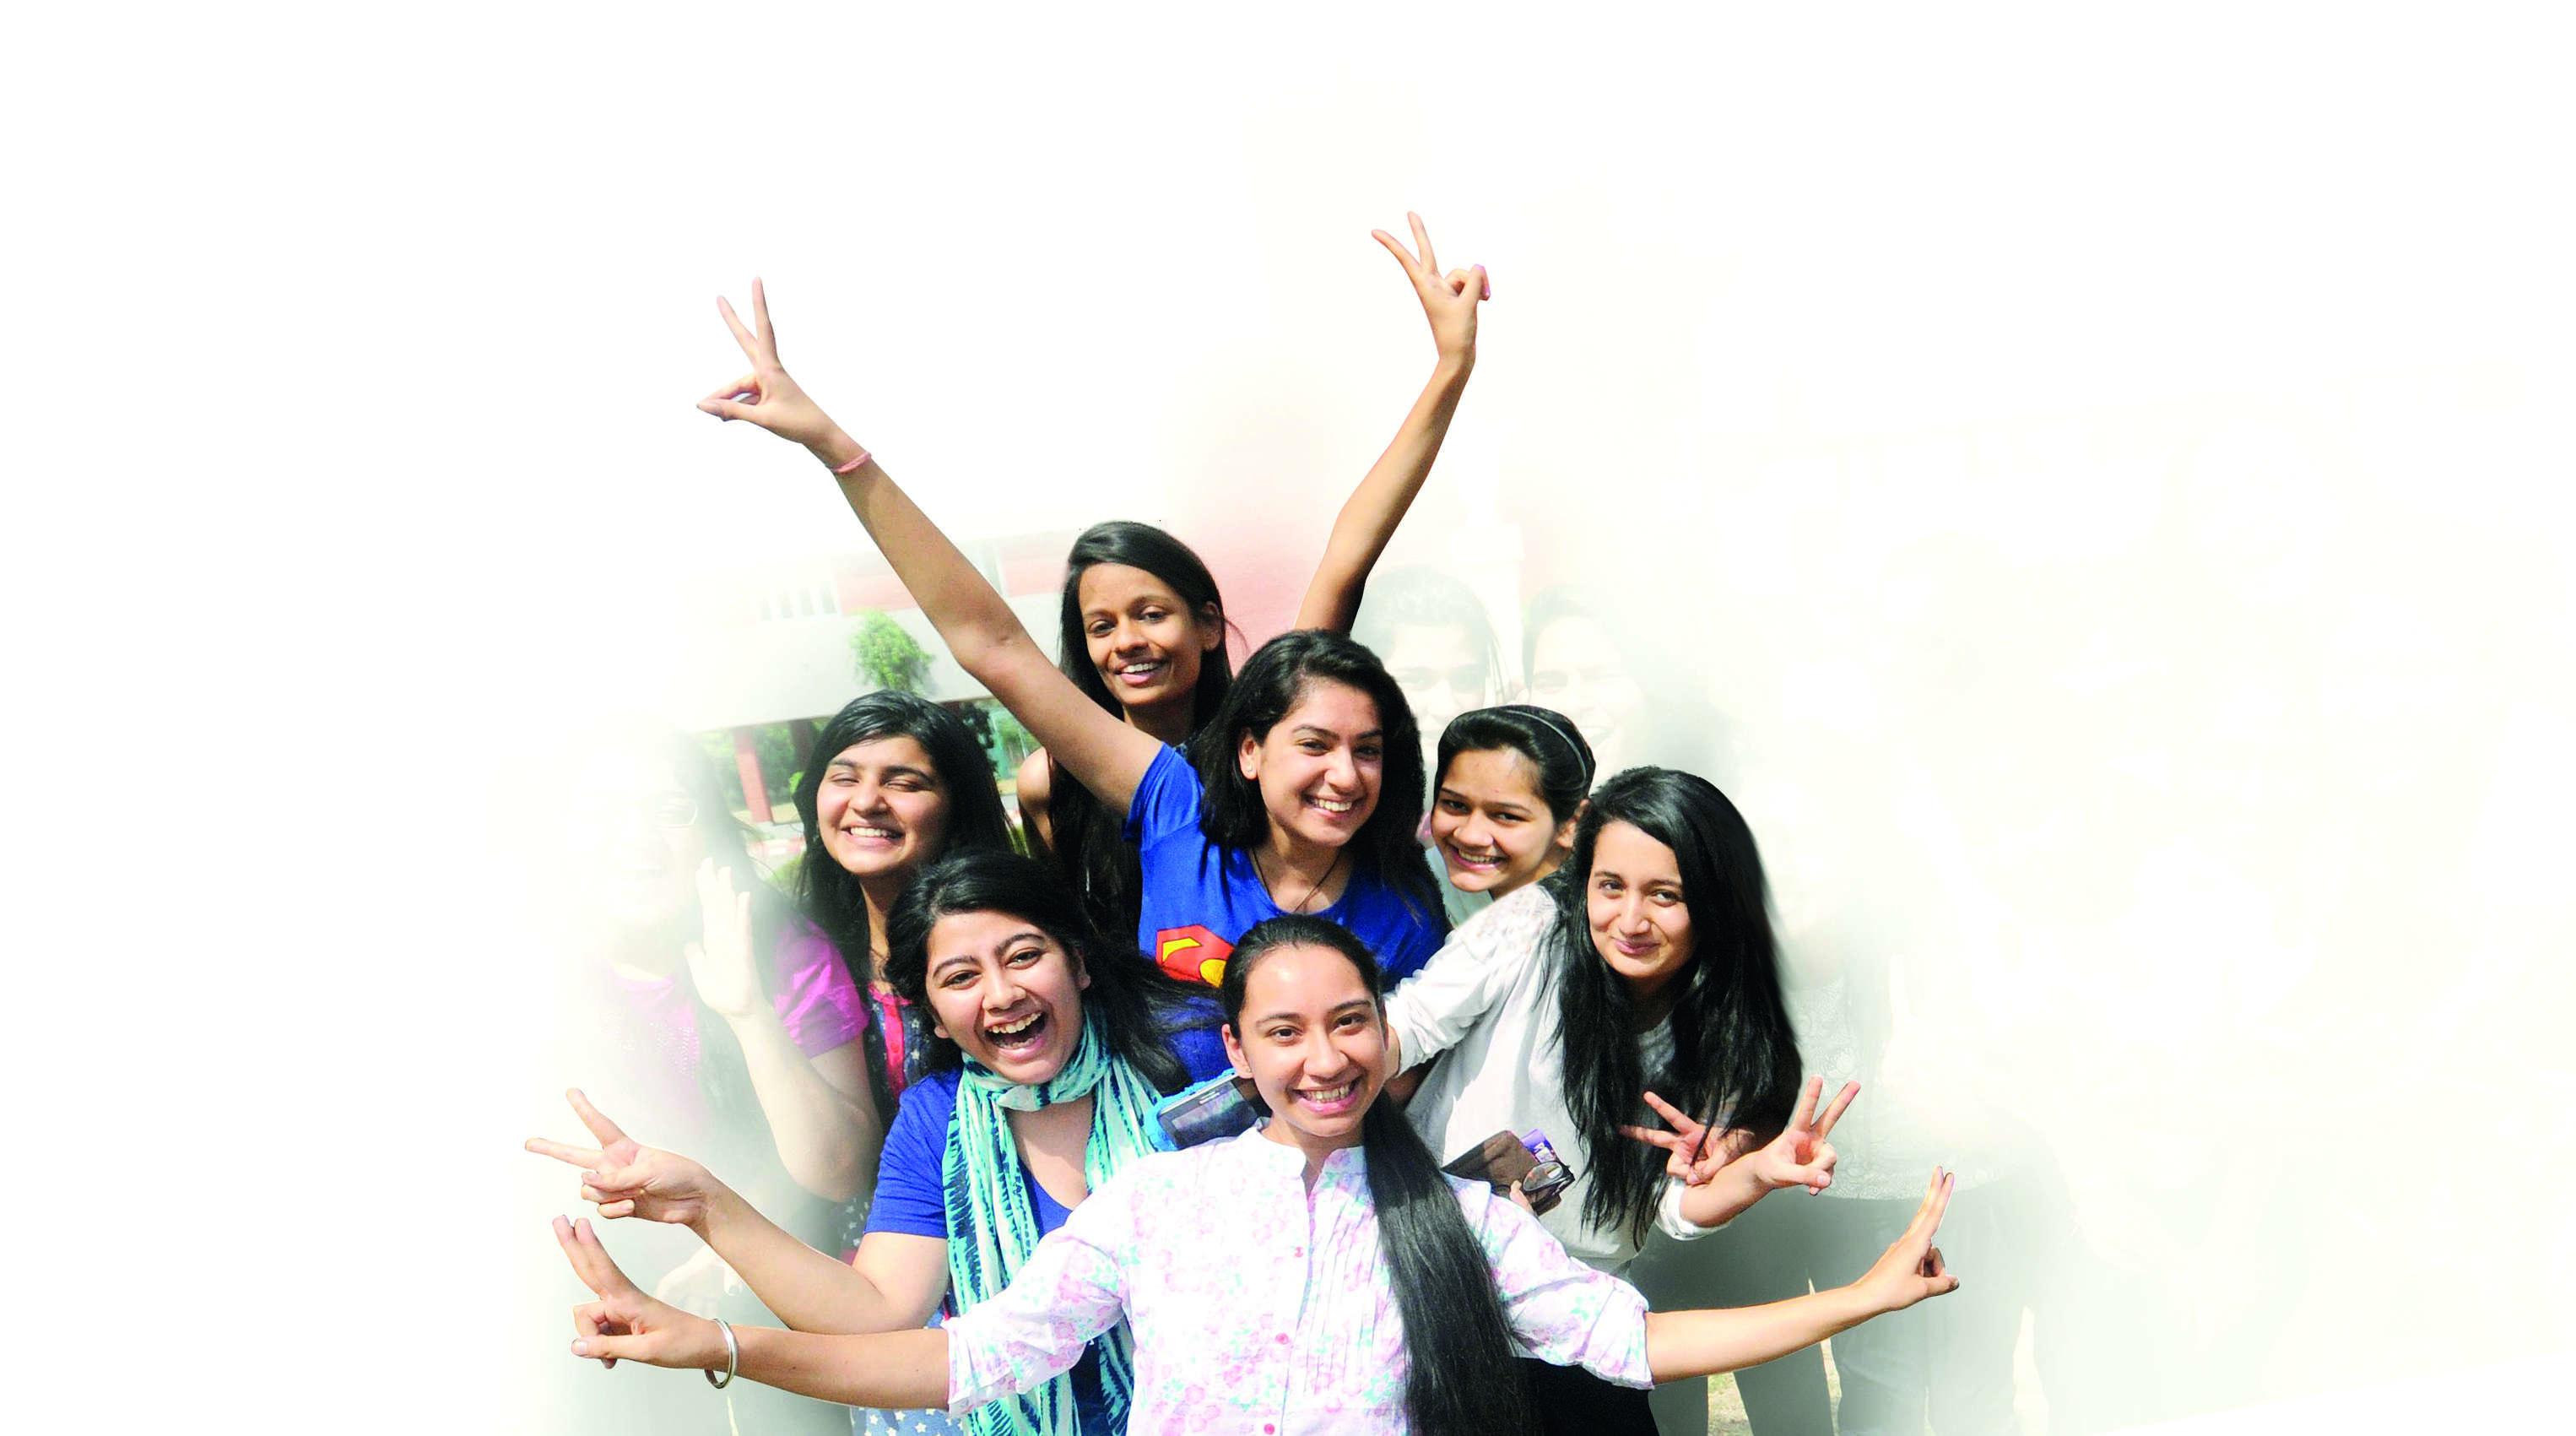 Girls shine in schools, but lose lustre in careers